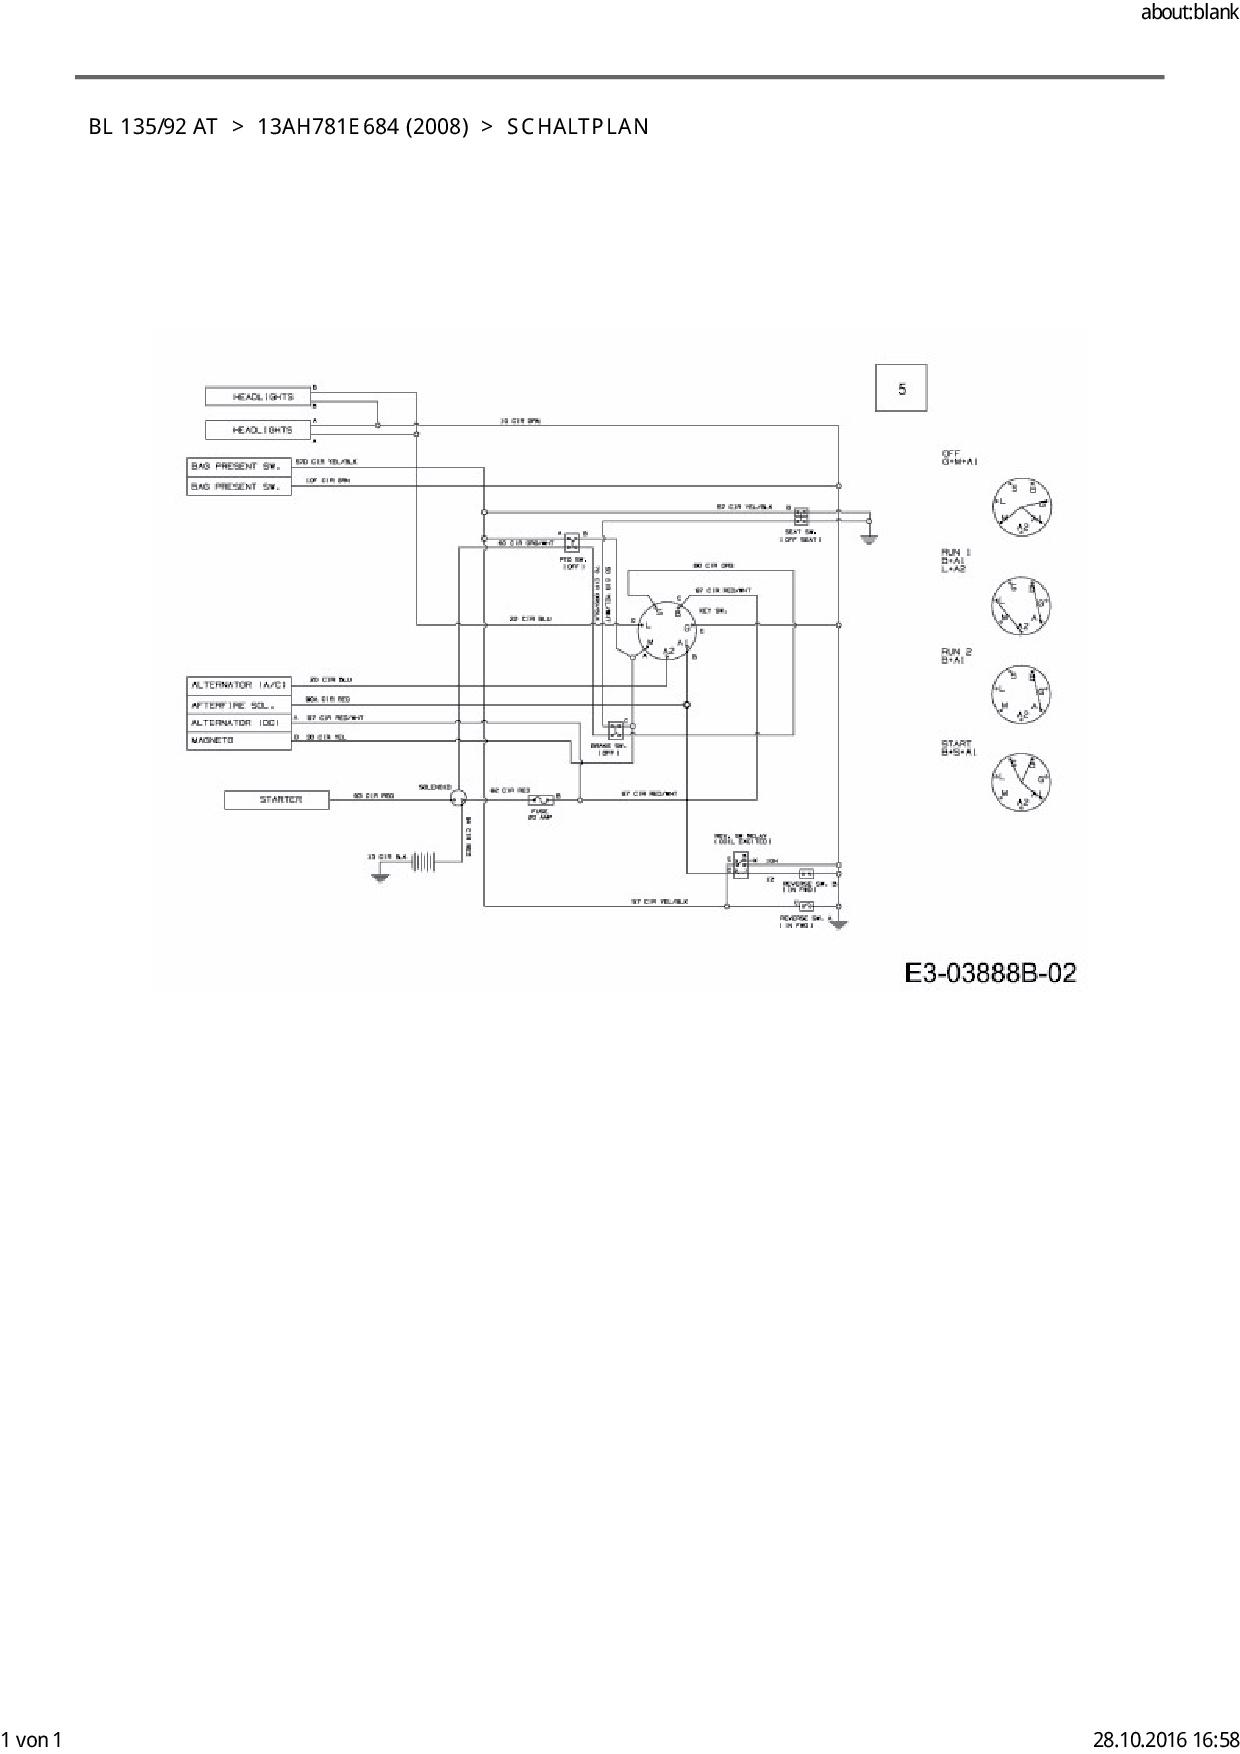 Erfreut Vh45de Schaltplan Galerie - Elektrische Schaltplan-Ideen ...